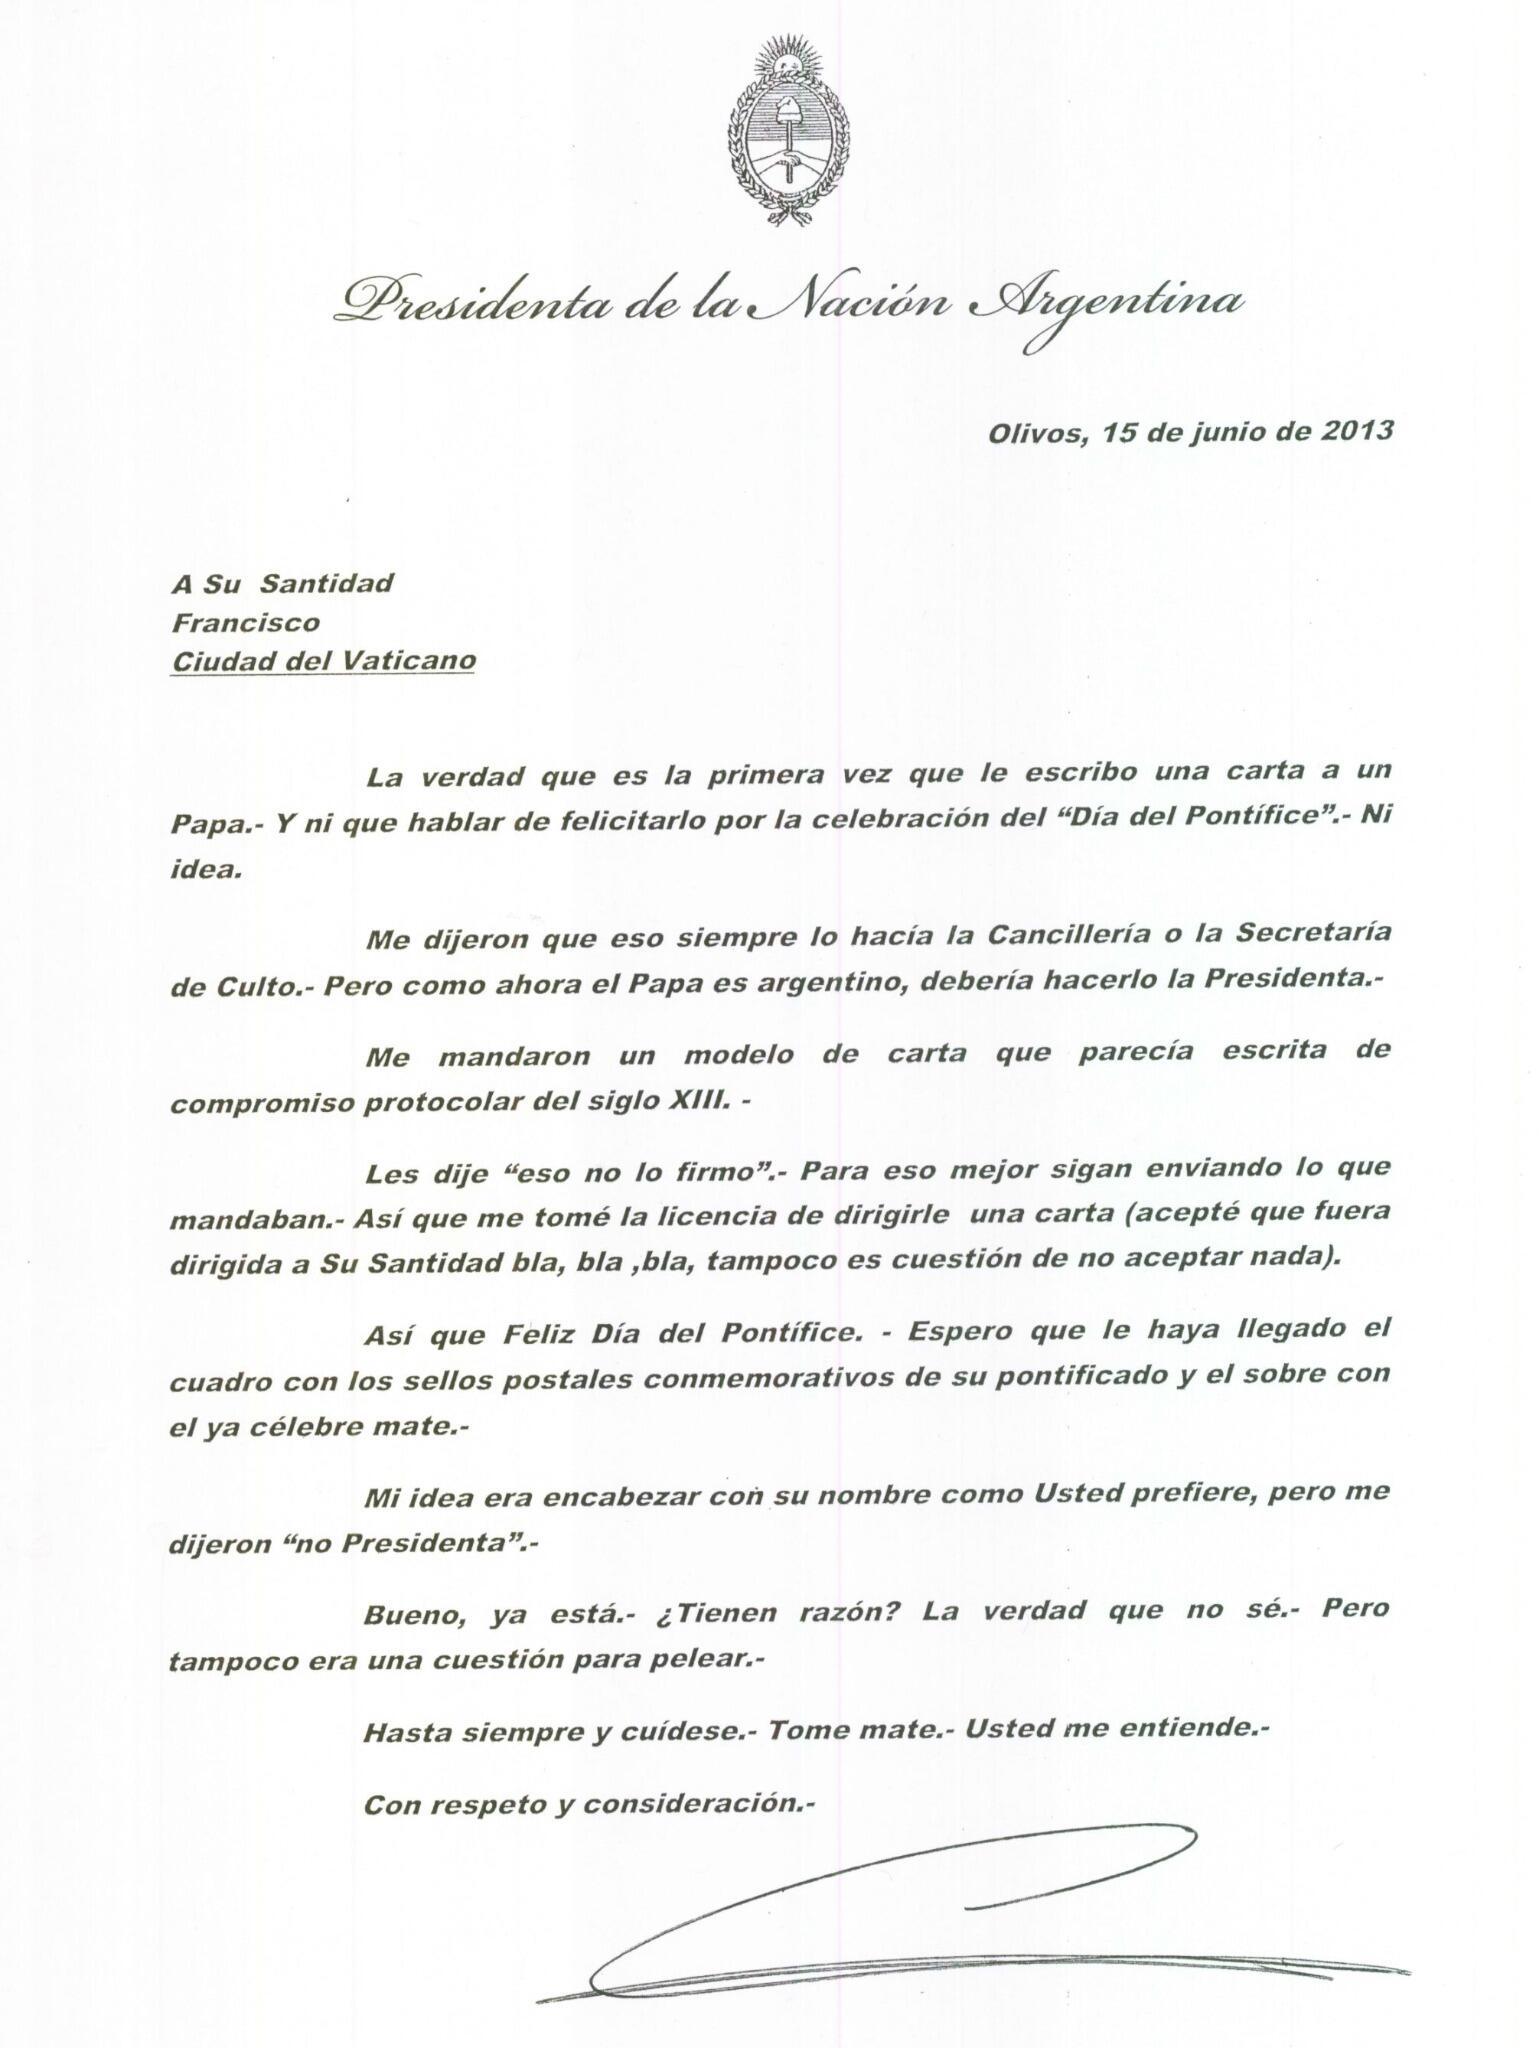 salvadorschwartzmann on twitter   u0026quot presidenta de argentina